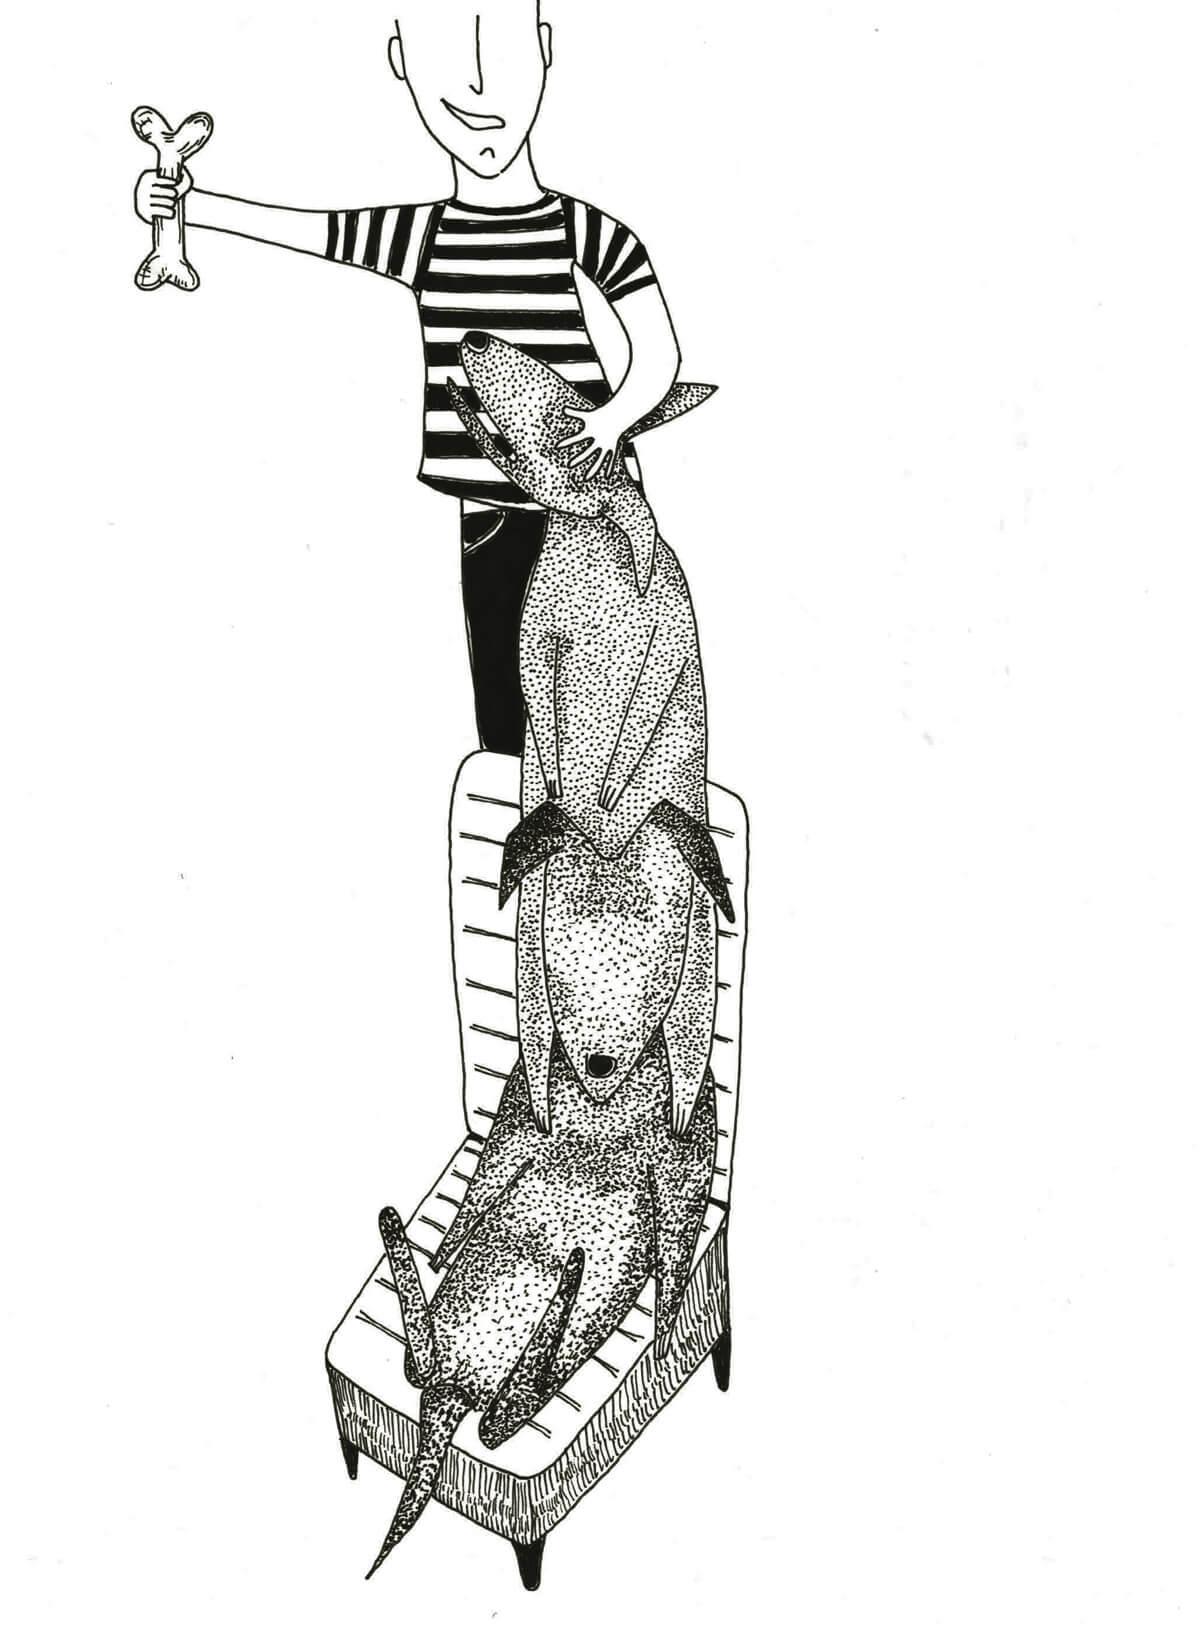 Microrrelatos caninos - Psicoanálisis